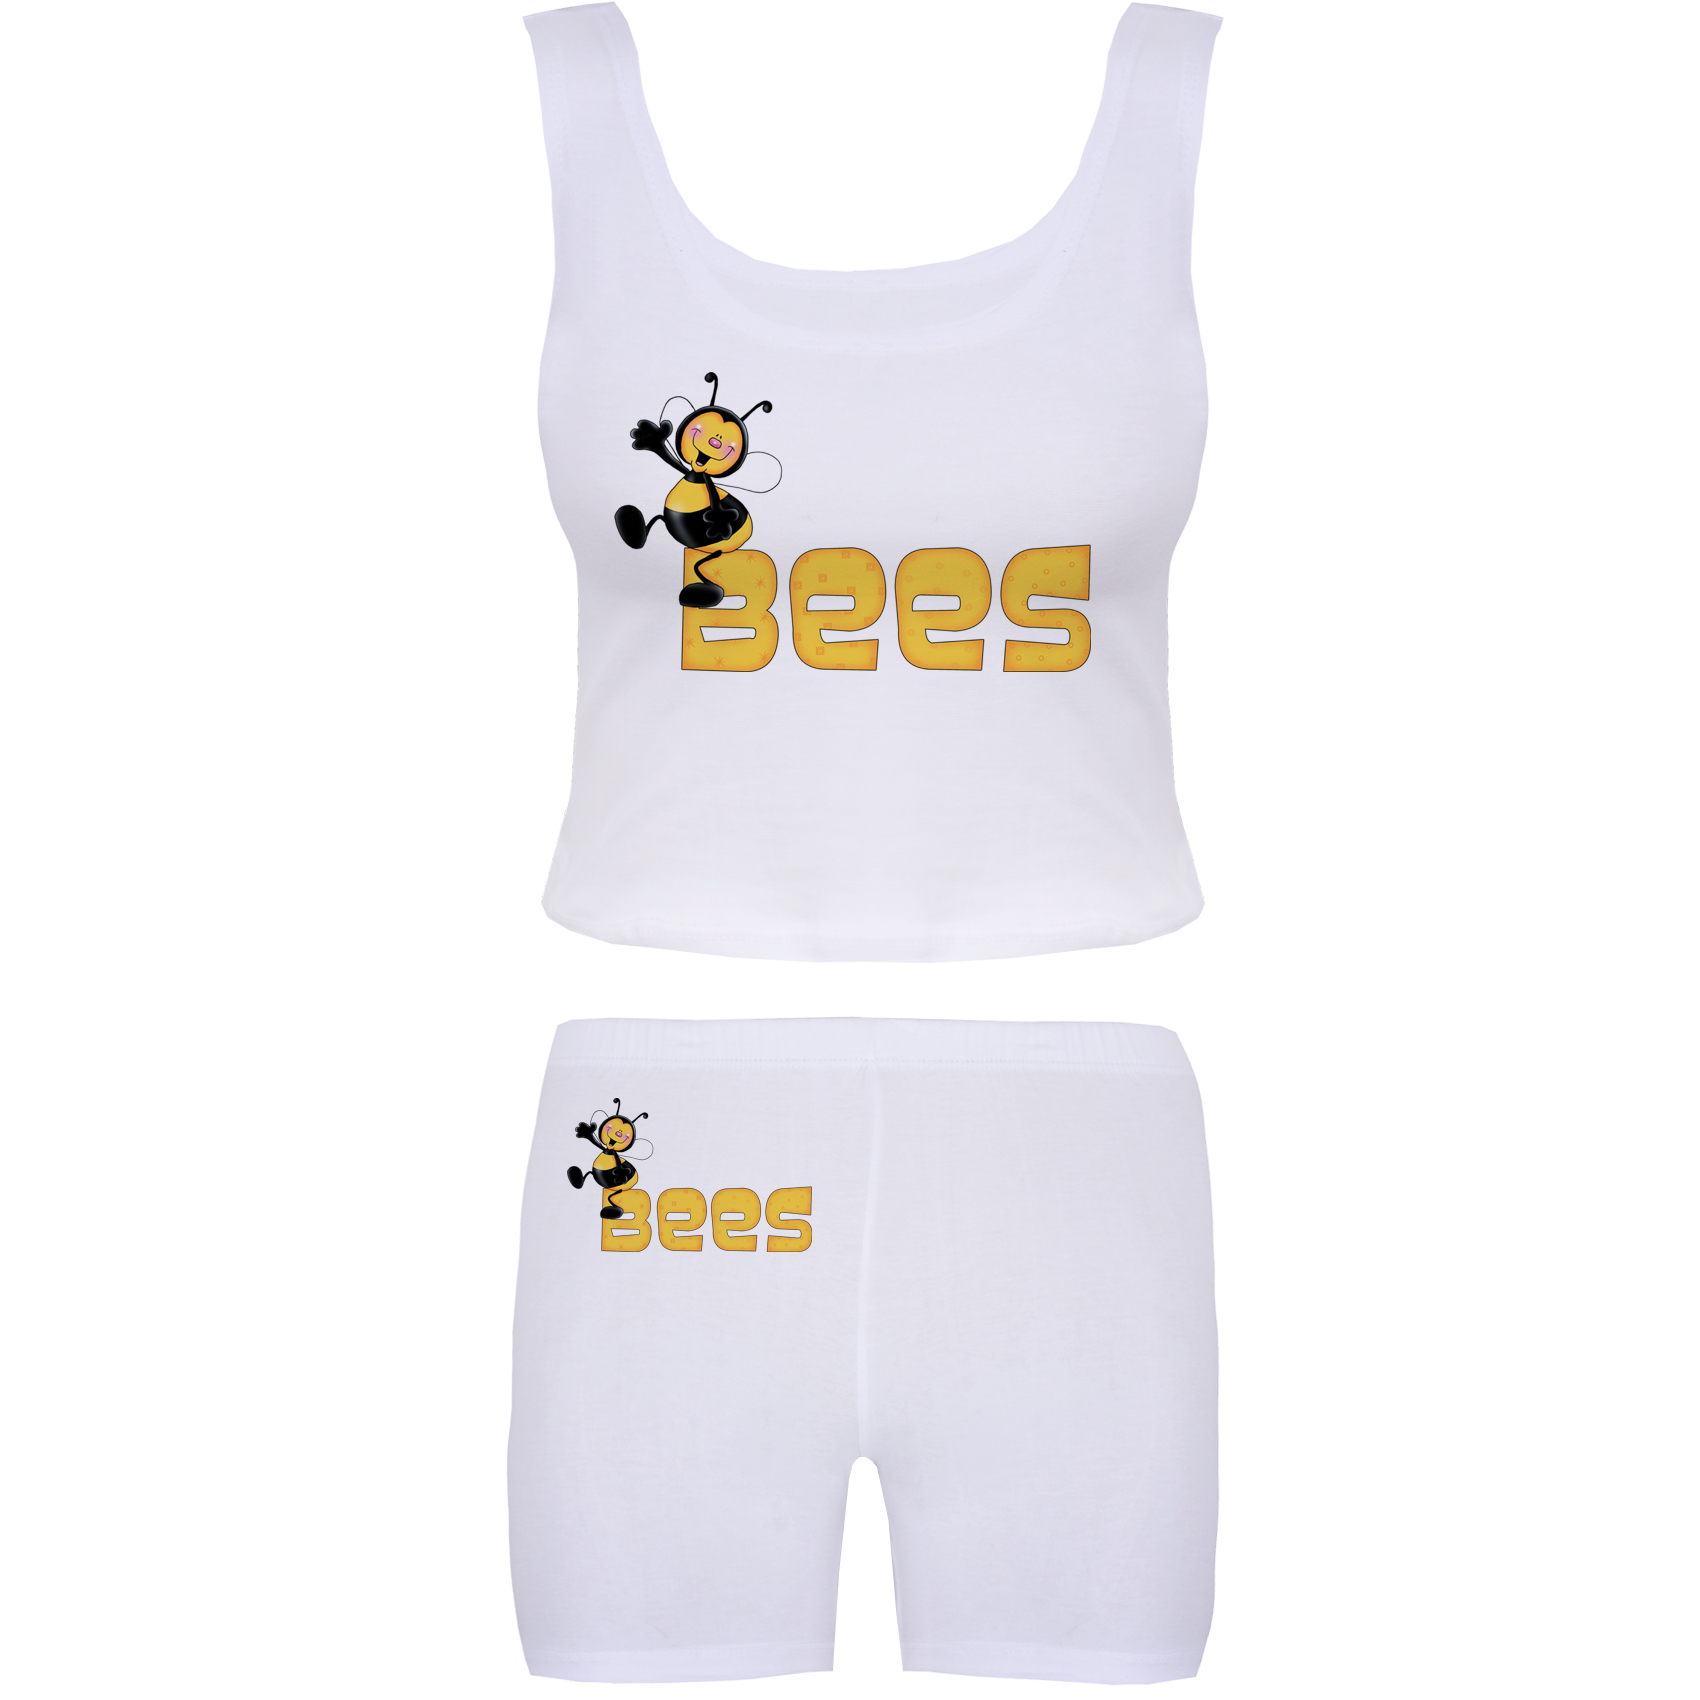 خرید                                      ست تاپ و شلوارک زنانه آکو طرح BEES کد BS90